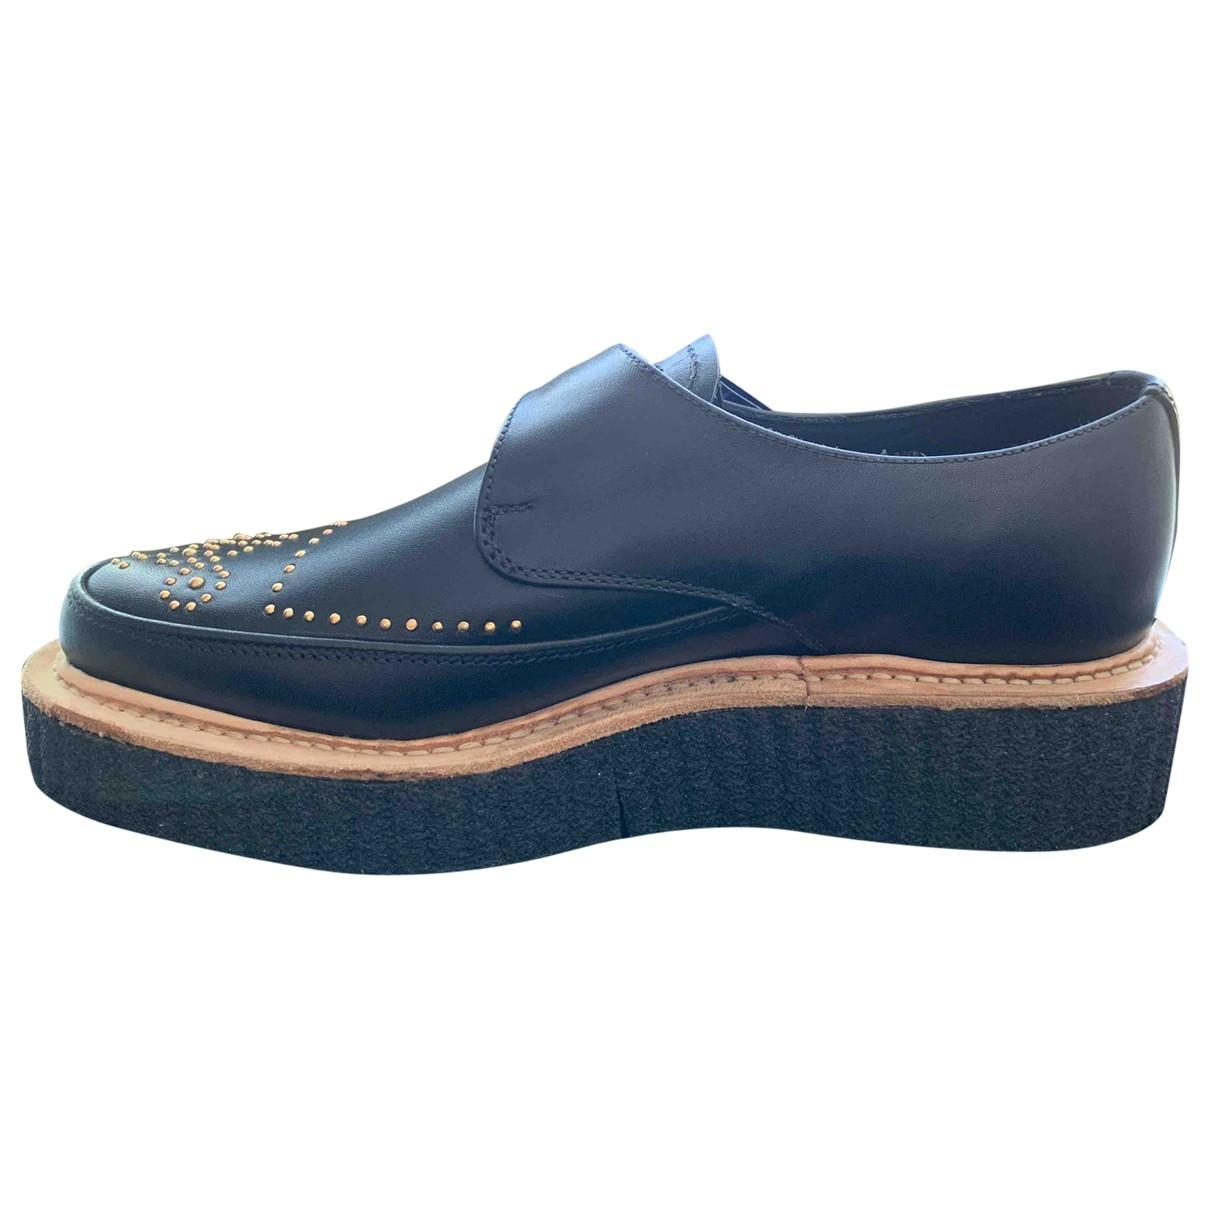 Rupert Sanderson \N Black Leather Flats for Women 38.5 EU